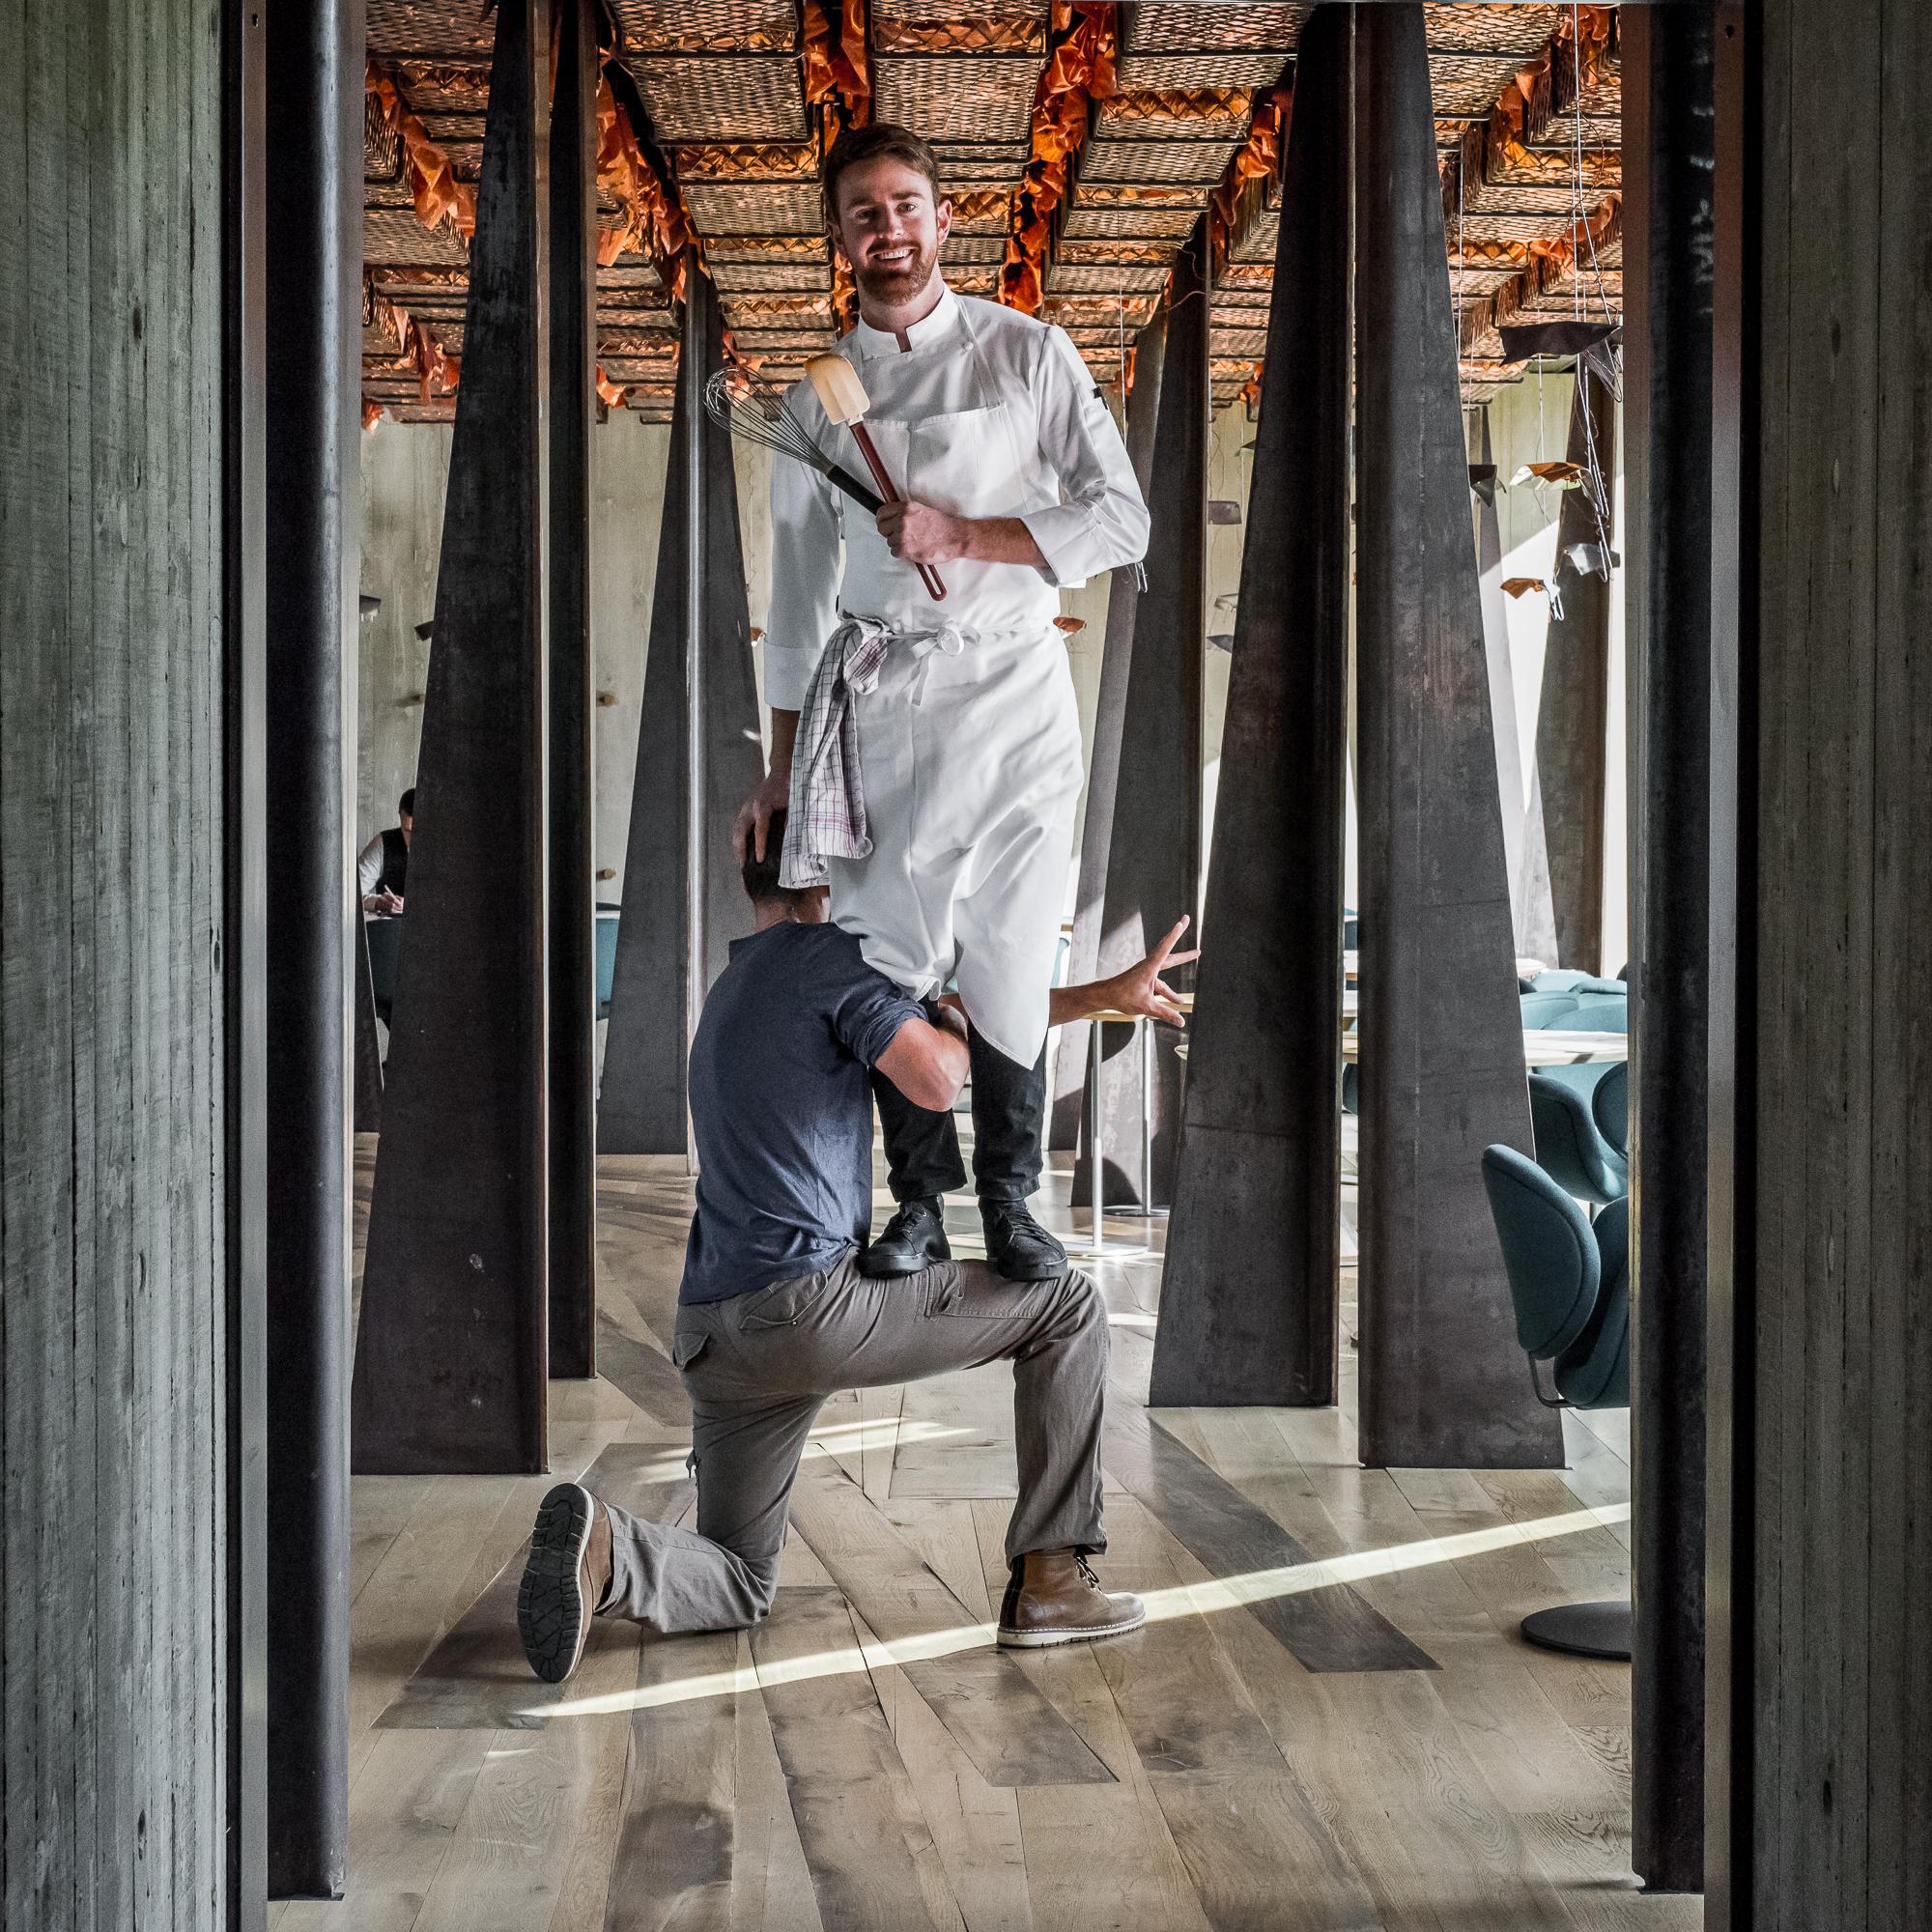 Restauration - La grande cuisine